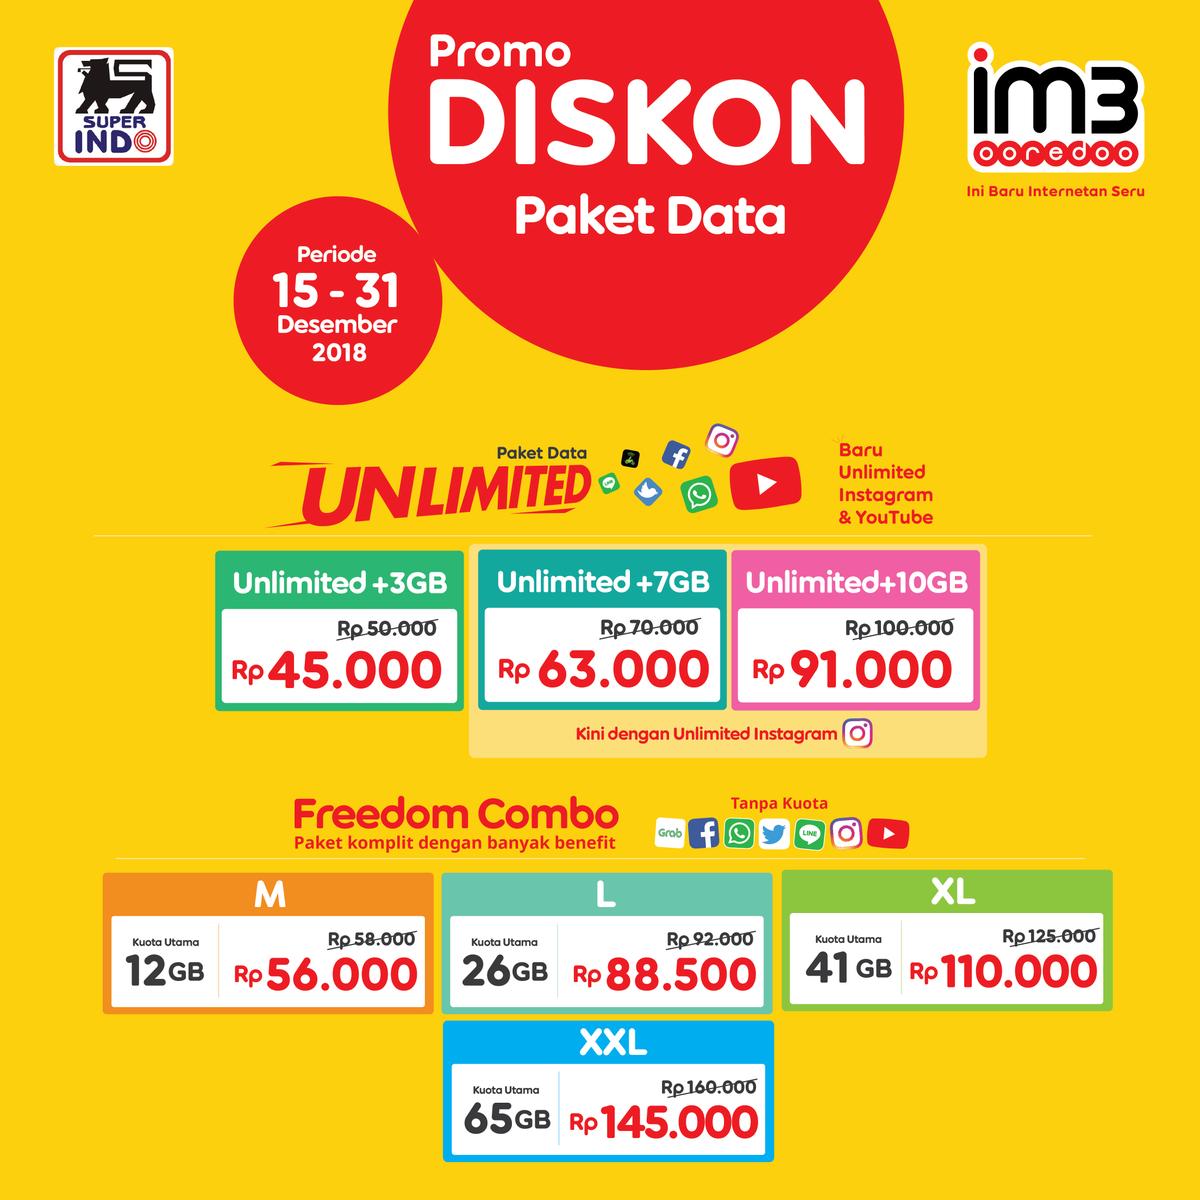 #Superindo - Promo Diskon Paket Data IM3 Ooredo MUlai 45K (s.d 31 Des 2018)